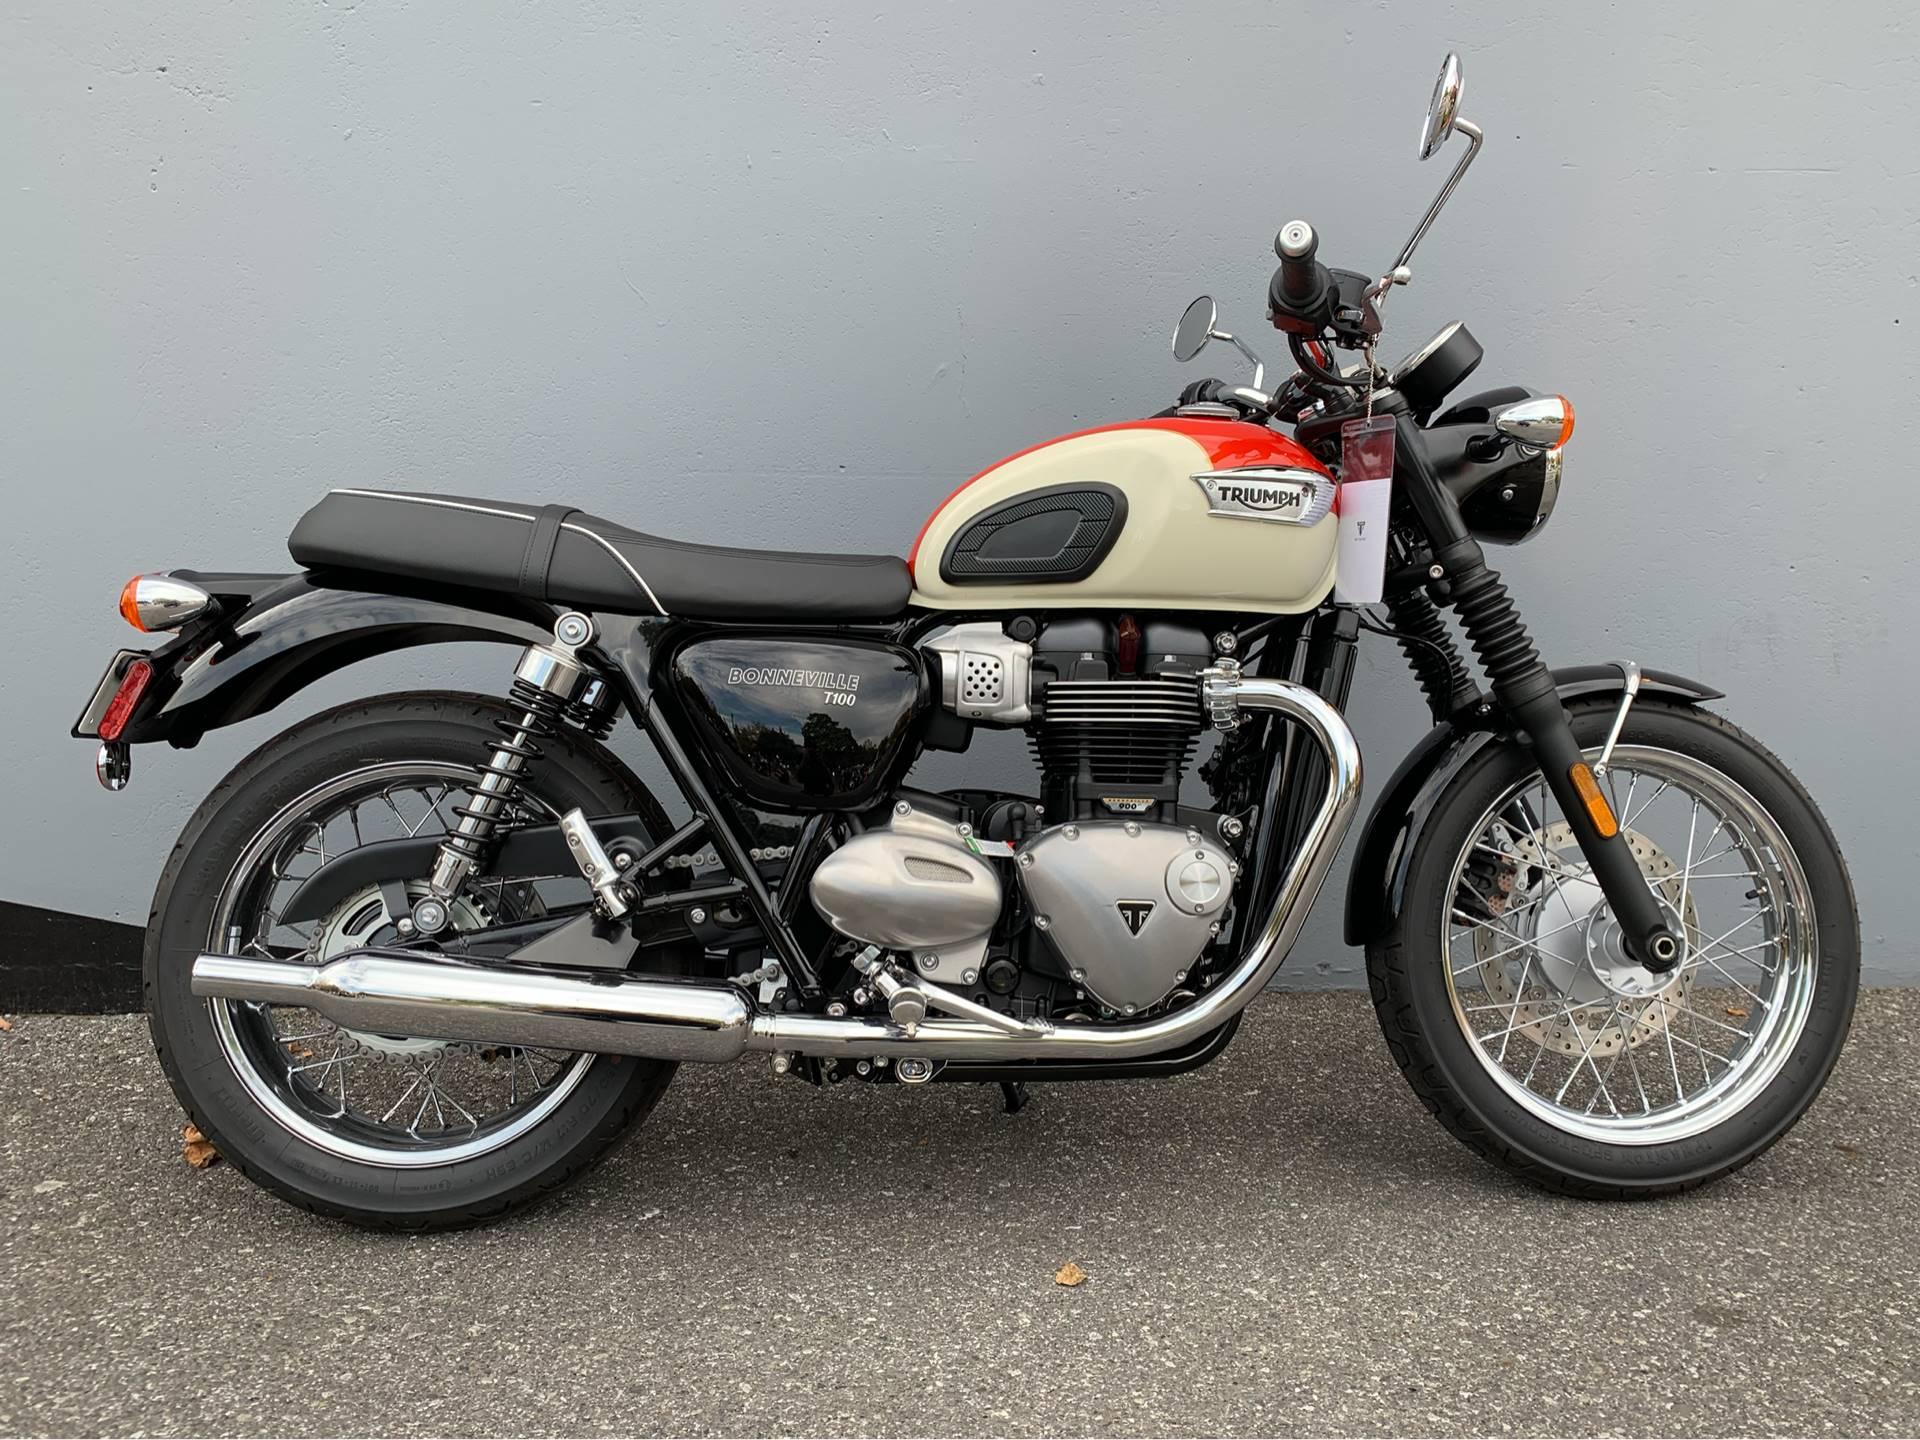 New 2019 Triumph Bonneville T100 Motorcycles In San Jose Ca Stock